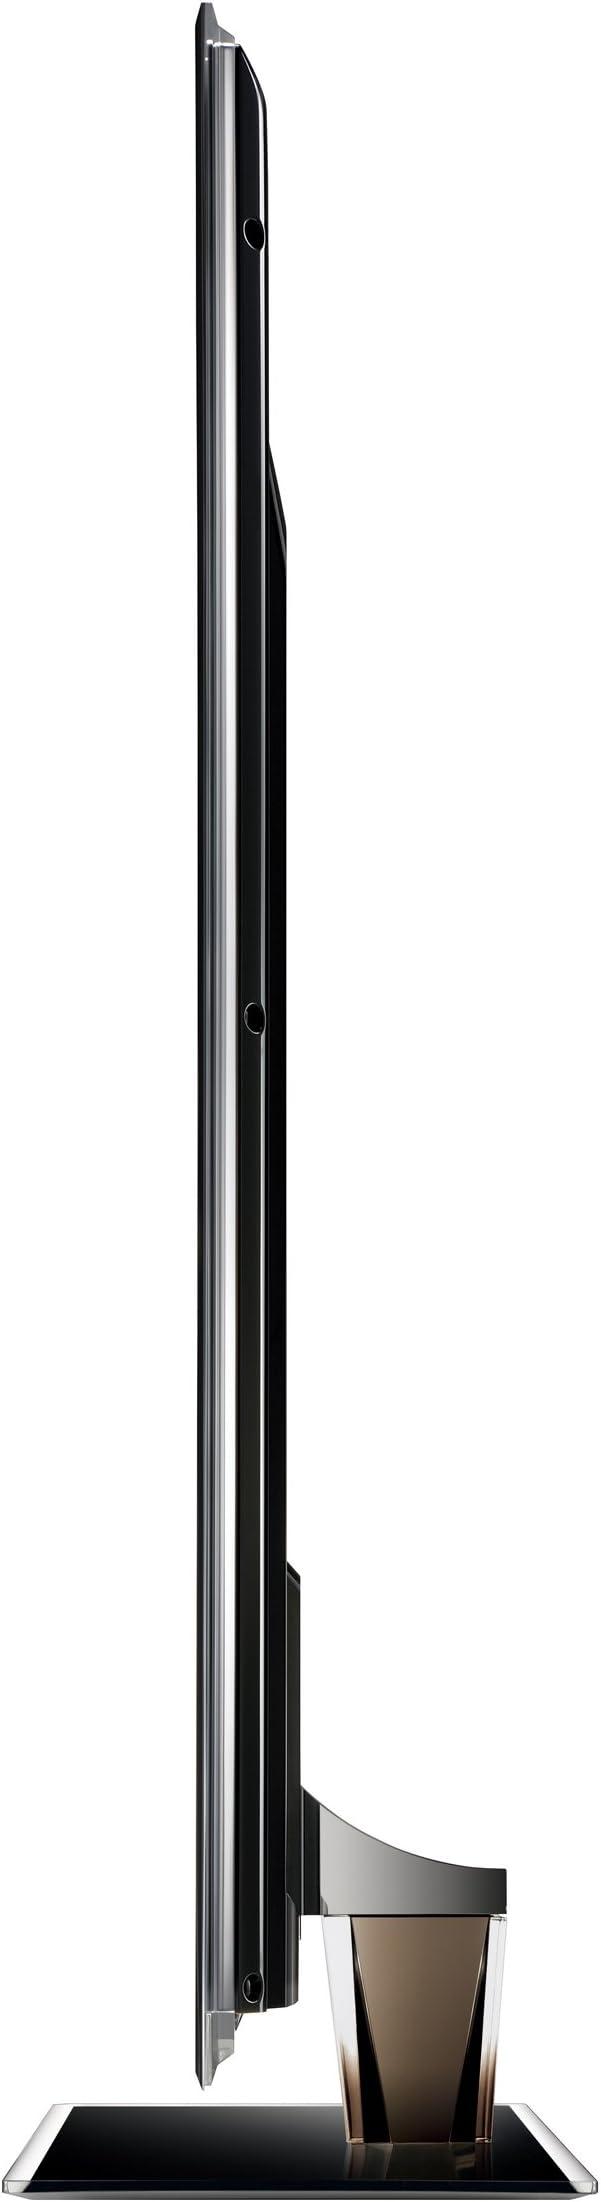 LG 47LE8500- Televisión Full HD, Pantalla LED 47 pulgadas: Amazon ...